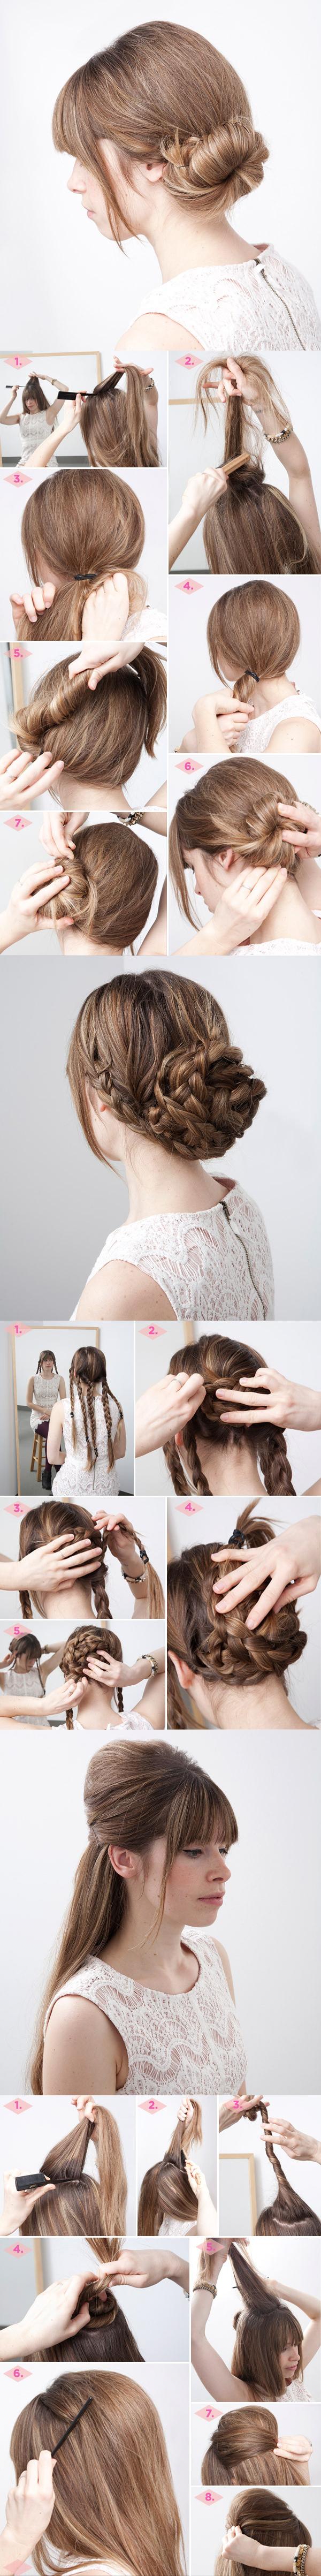 Pleasing 13 Rather Simple Bun Hairstyles Tutorials For 2014 Pretty Designs Hairstyles For Women Draintrainus